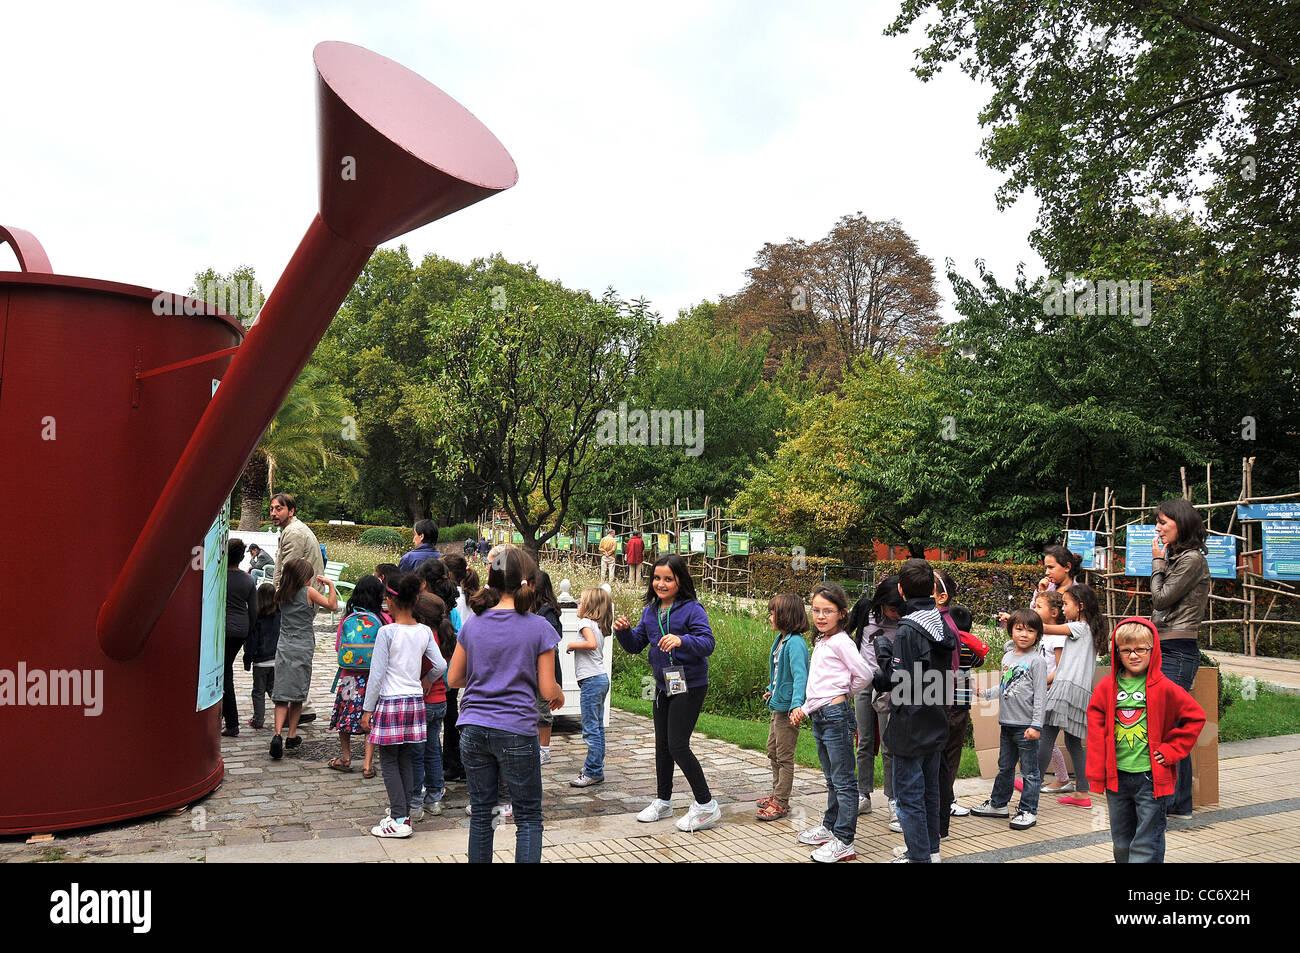 schoolchildren before giant watering can visiting Bercy garden Paris France - Stock Image